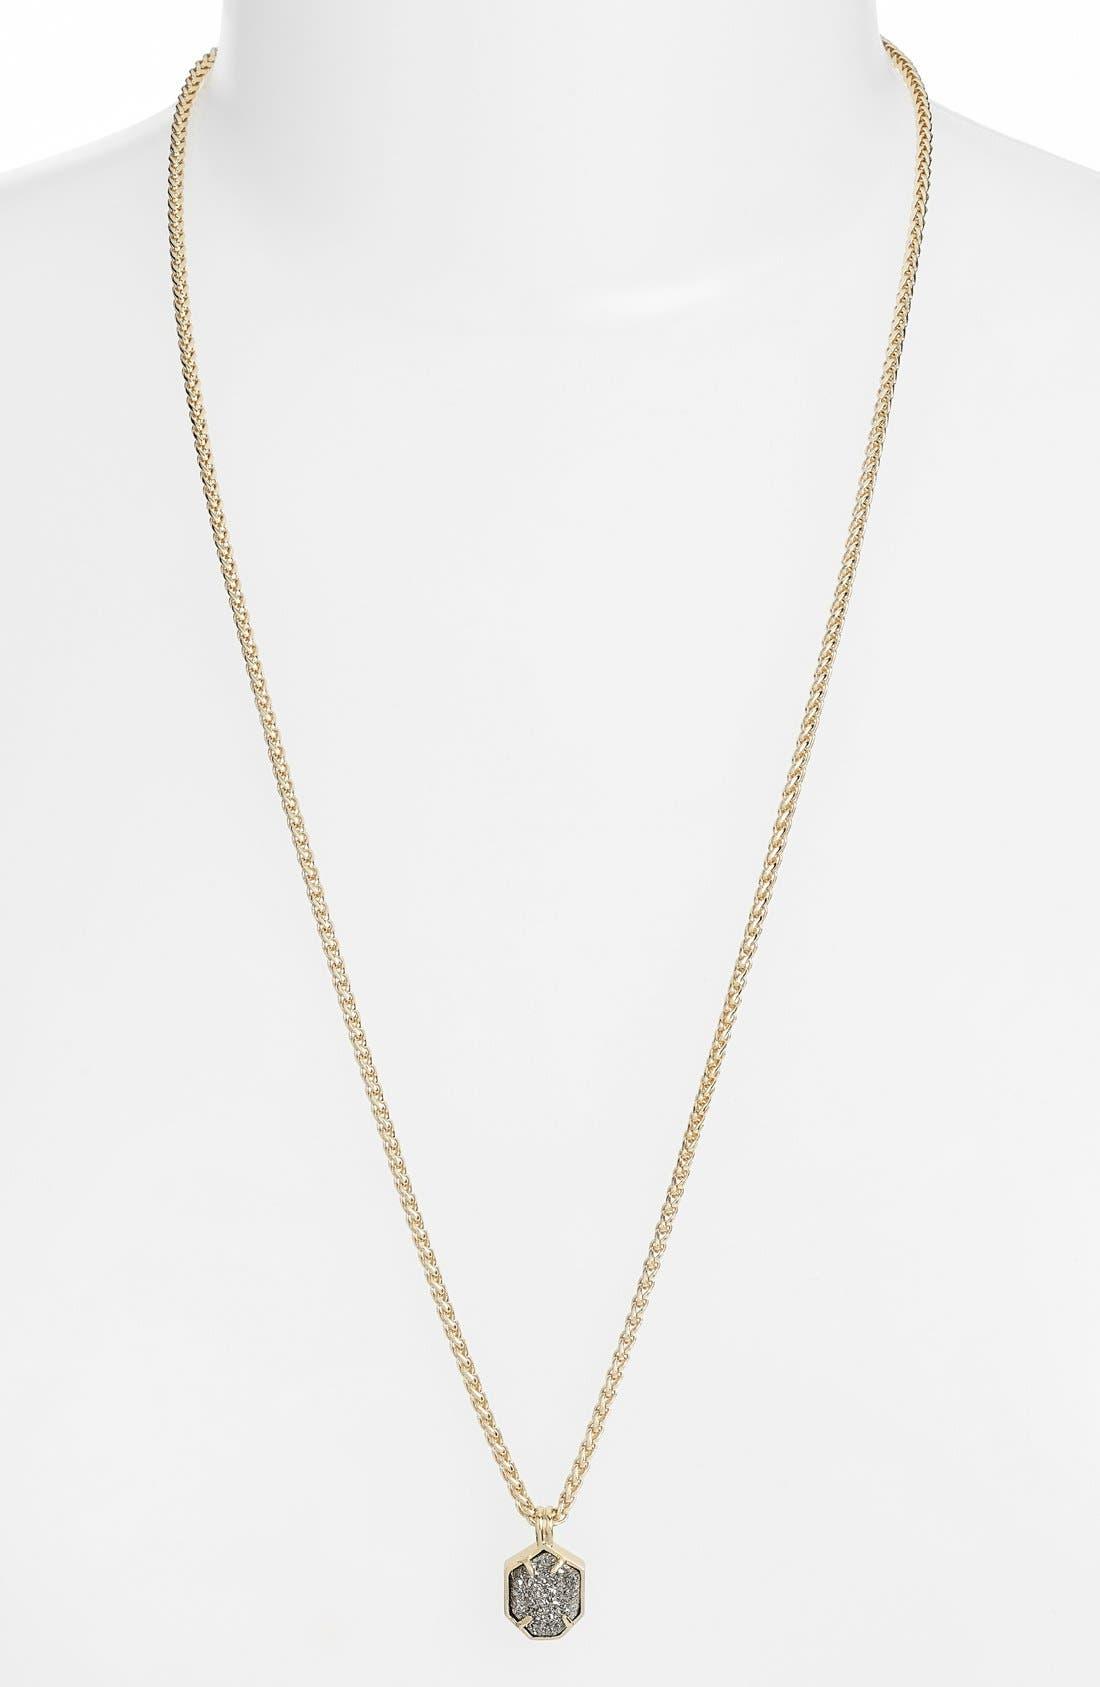 Main Image - Kendra Scott 'Oliver' Pendant Necklace